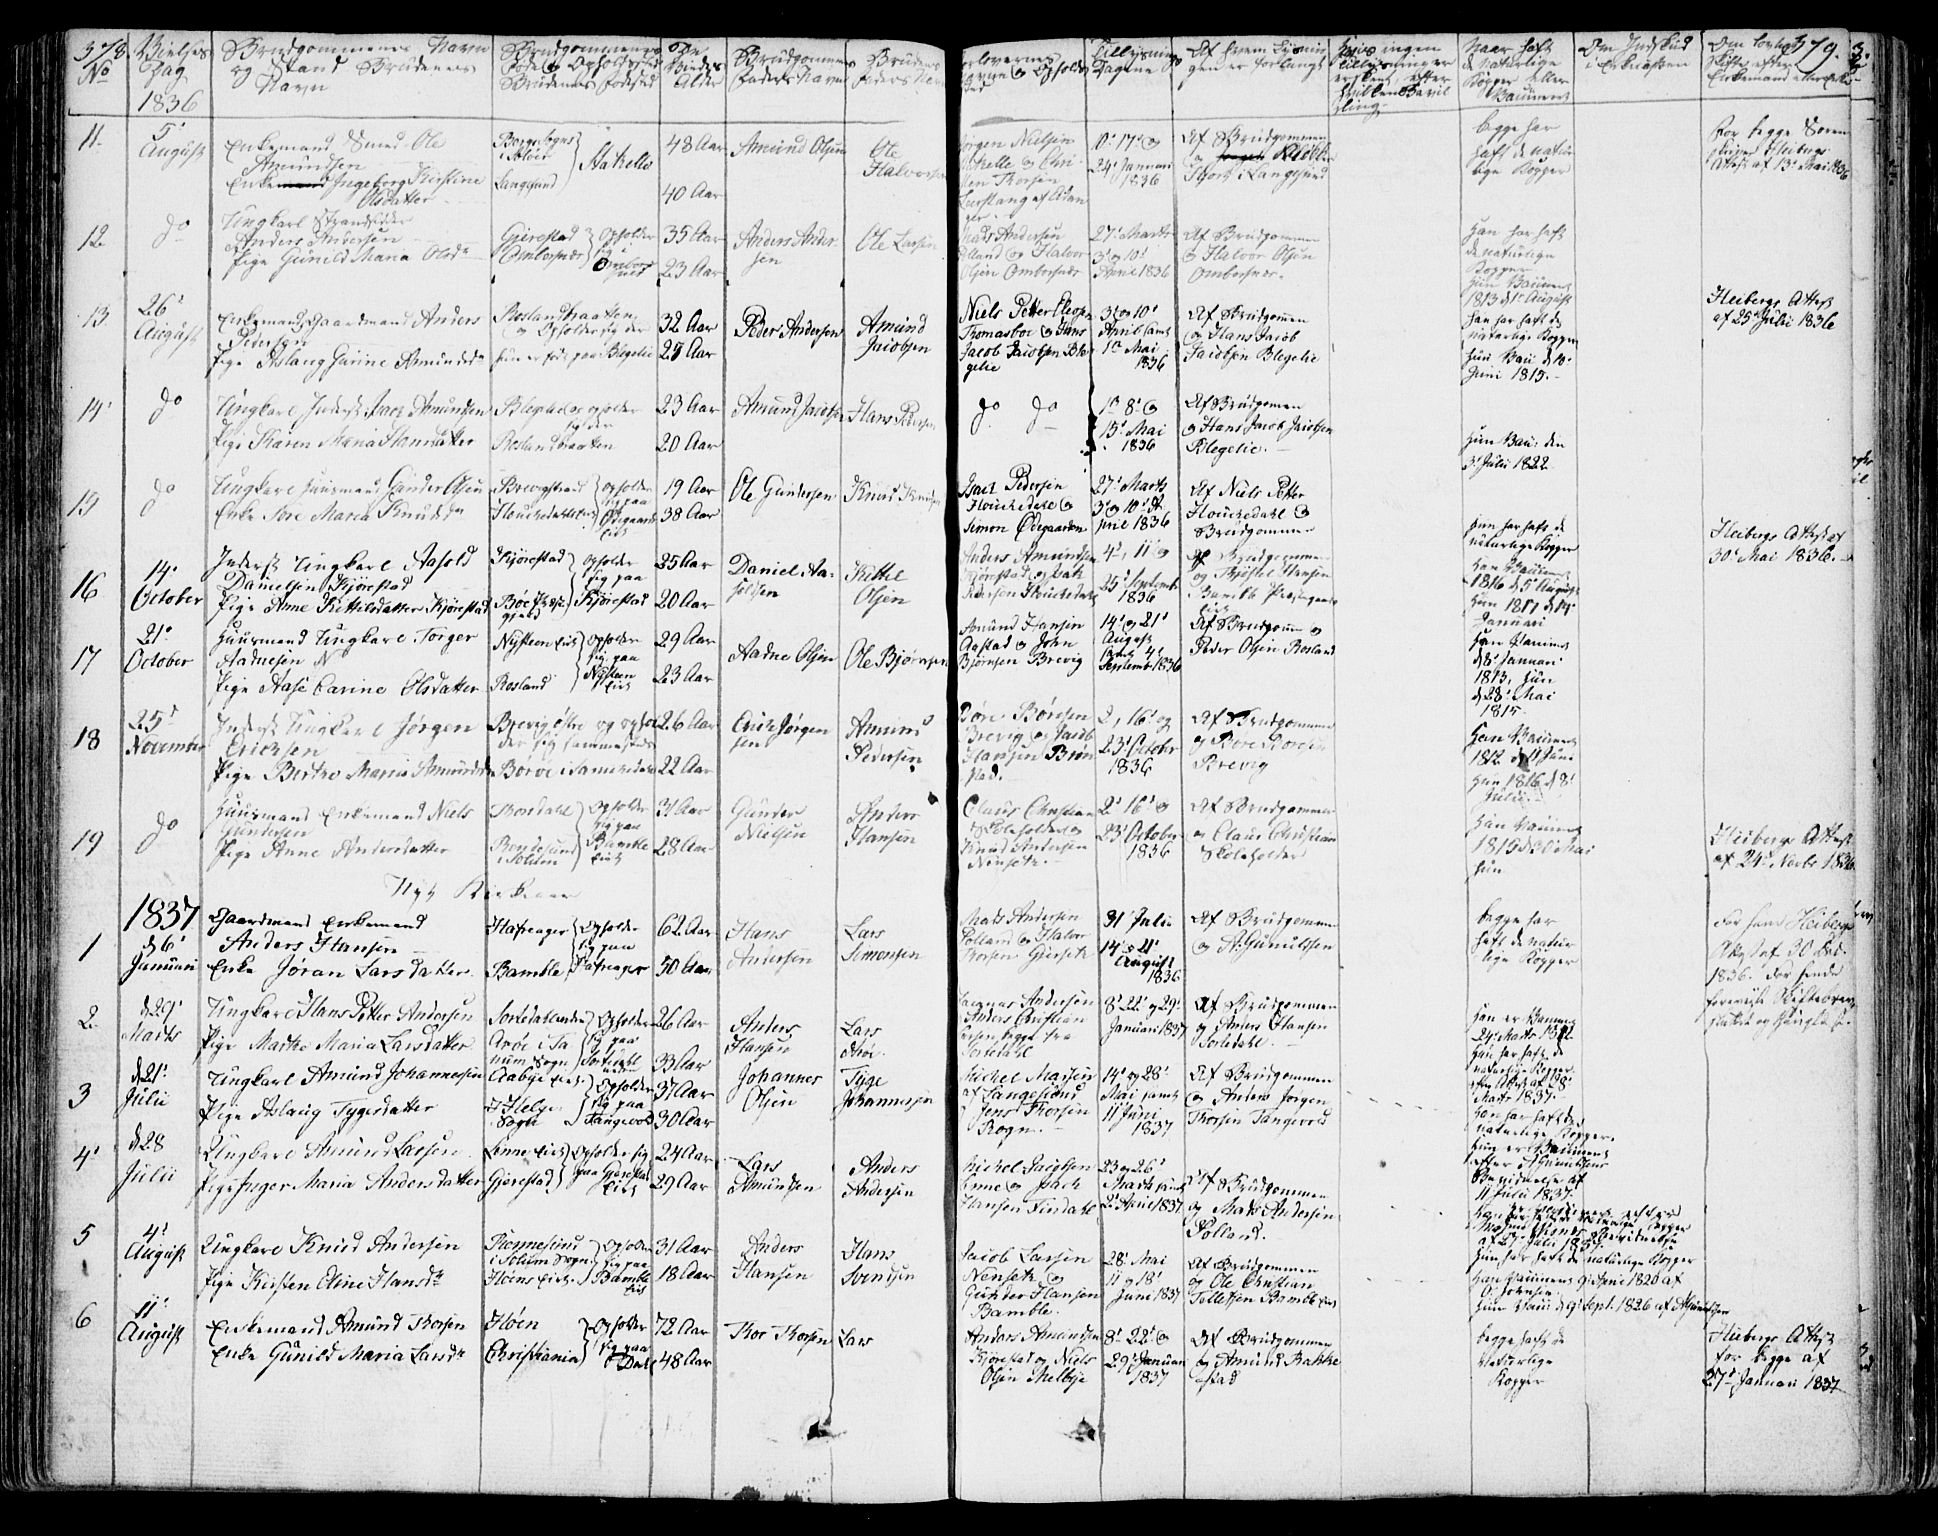 SAKO, Bamble kirkebøker, F/Fa/L0004: Ministerialbok nr. I 4, 1834-1853, s. 378-379